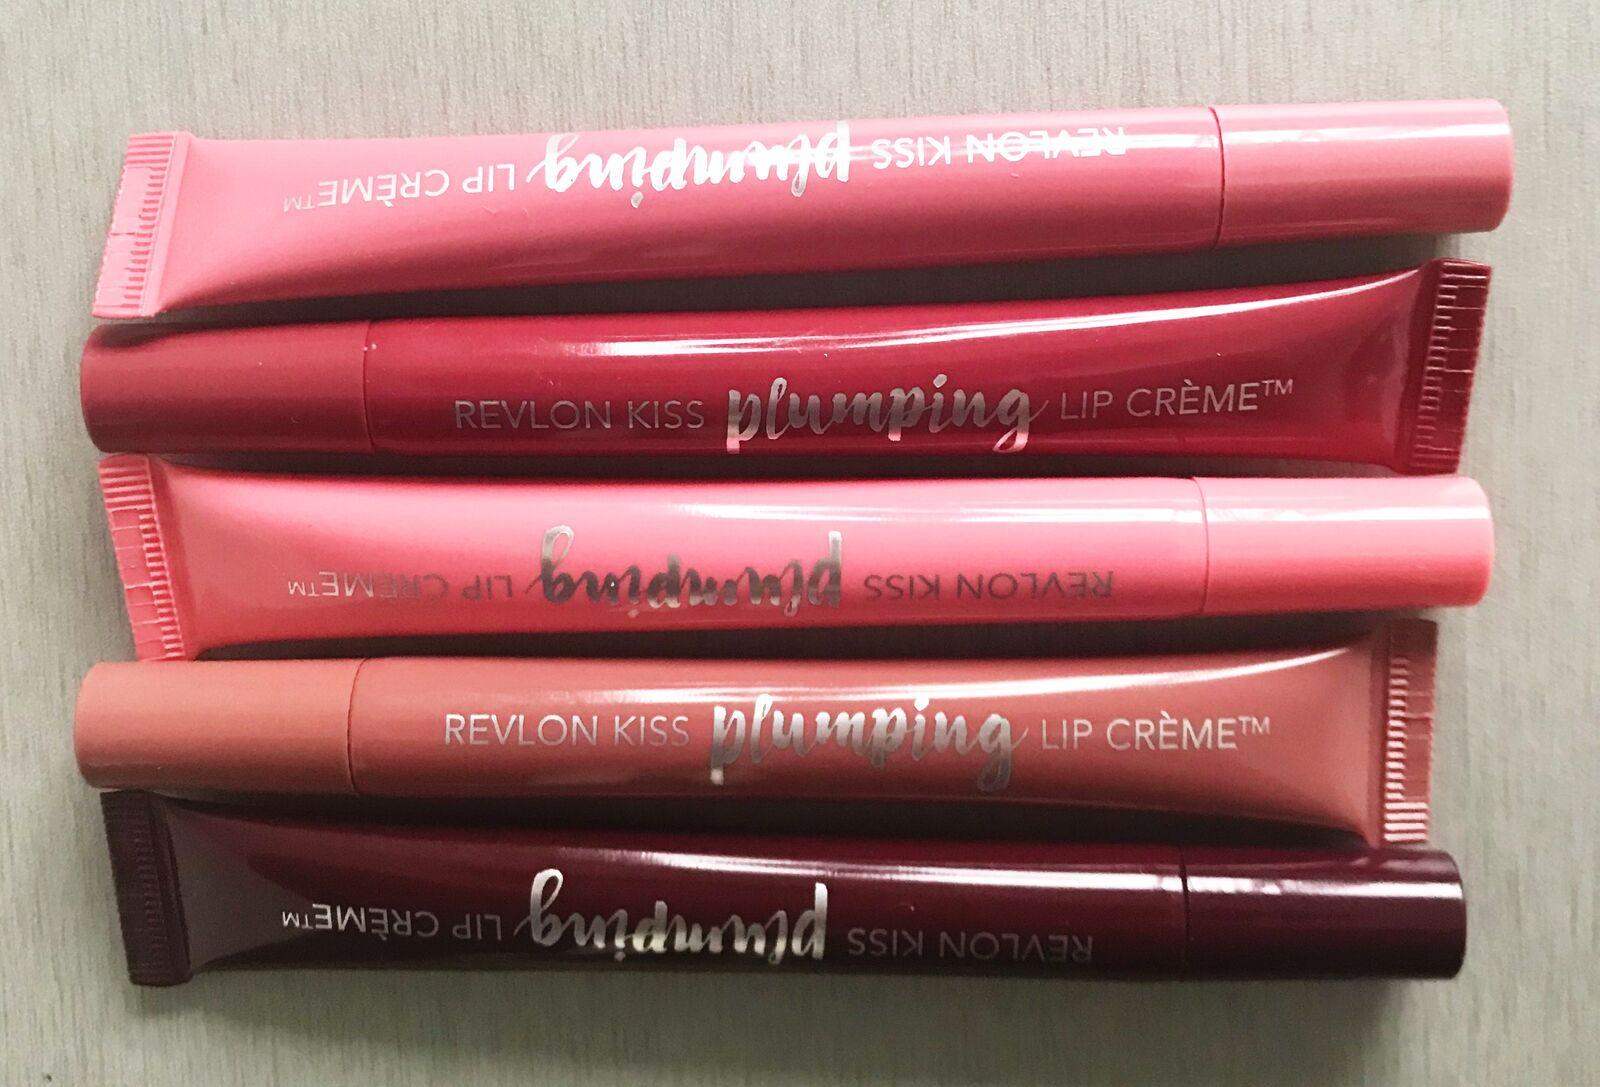 Revlon Kiss Lip Plumping Creme